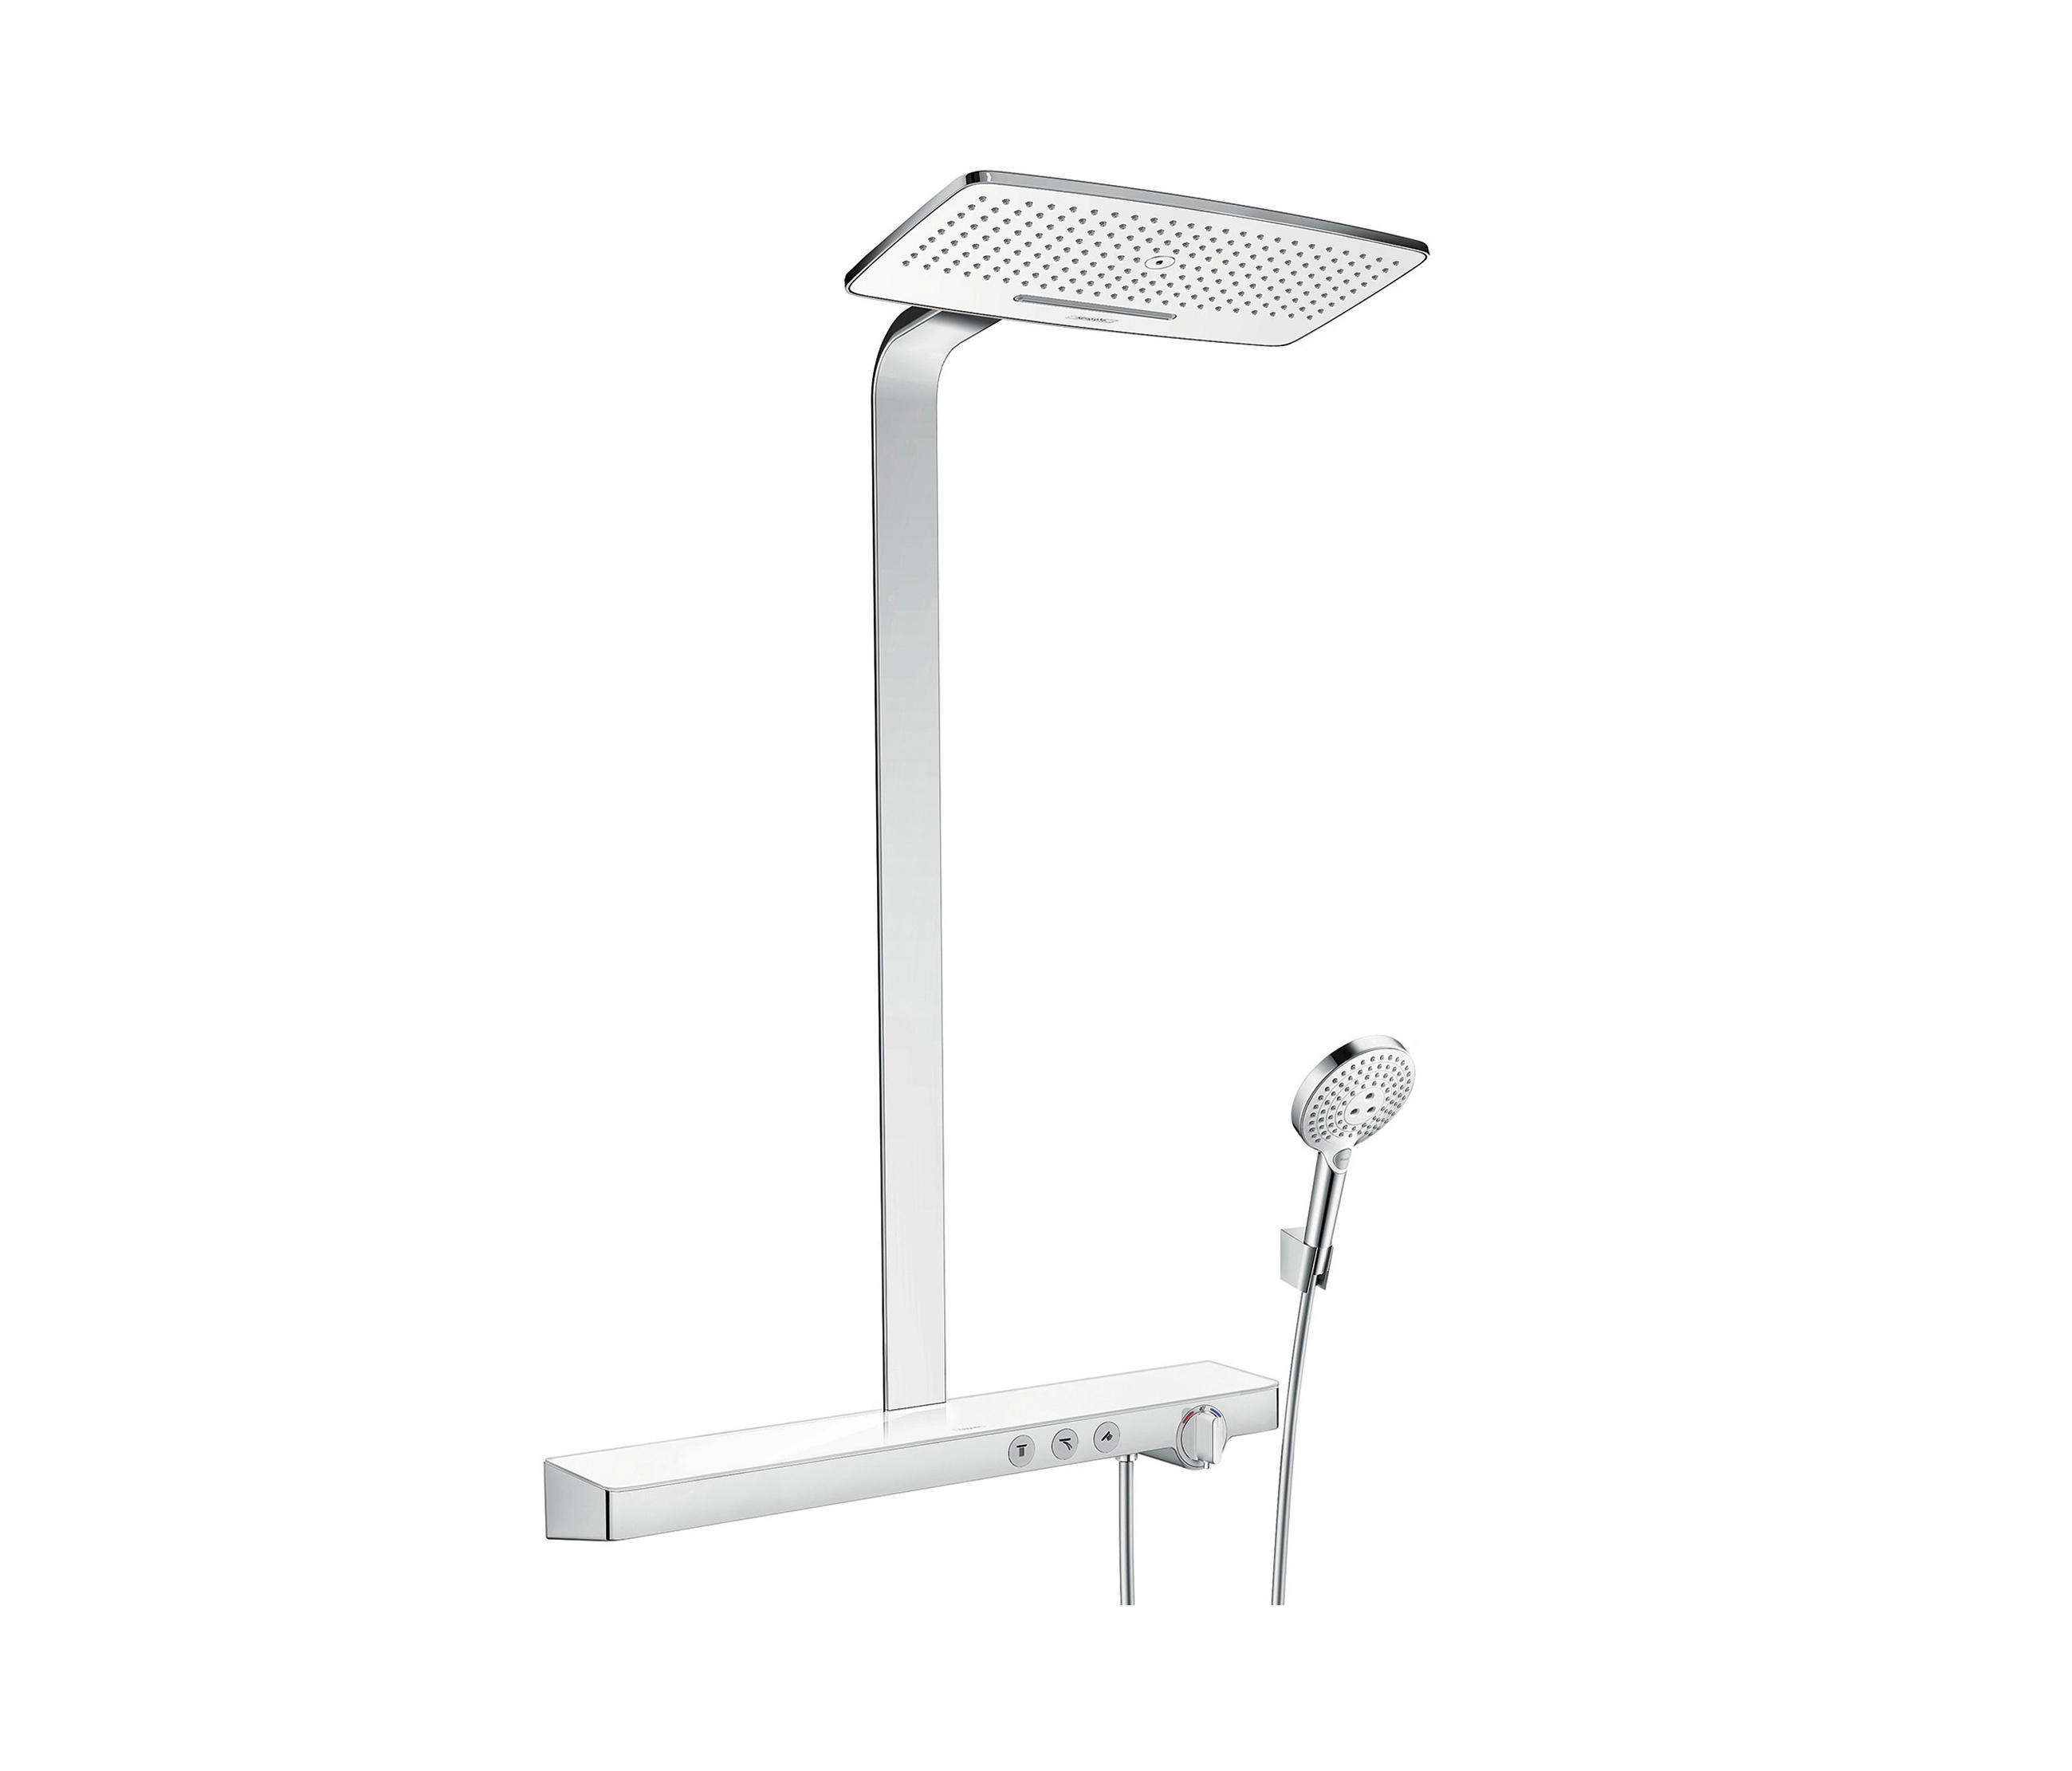 hansgrohe showerpipe rainmaker select 420 2jet. Black Bedroom Furniture Sets. Home Design Ideas